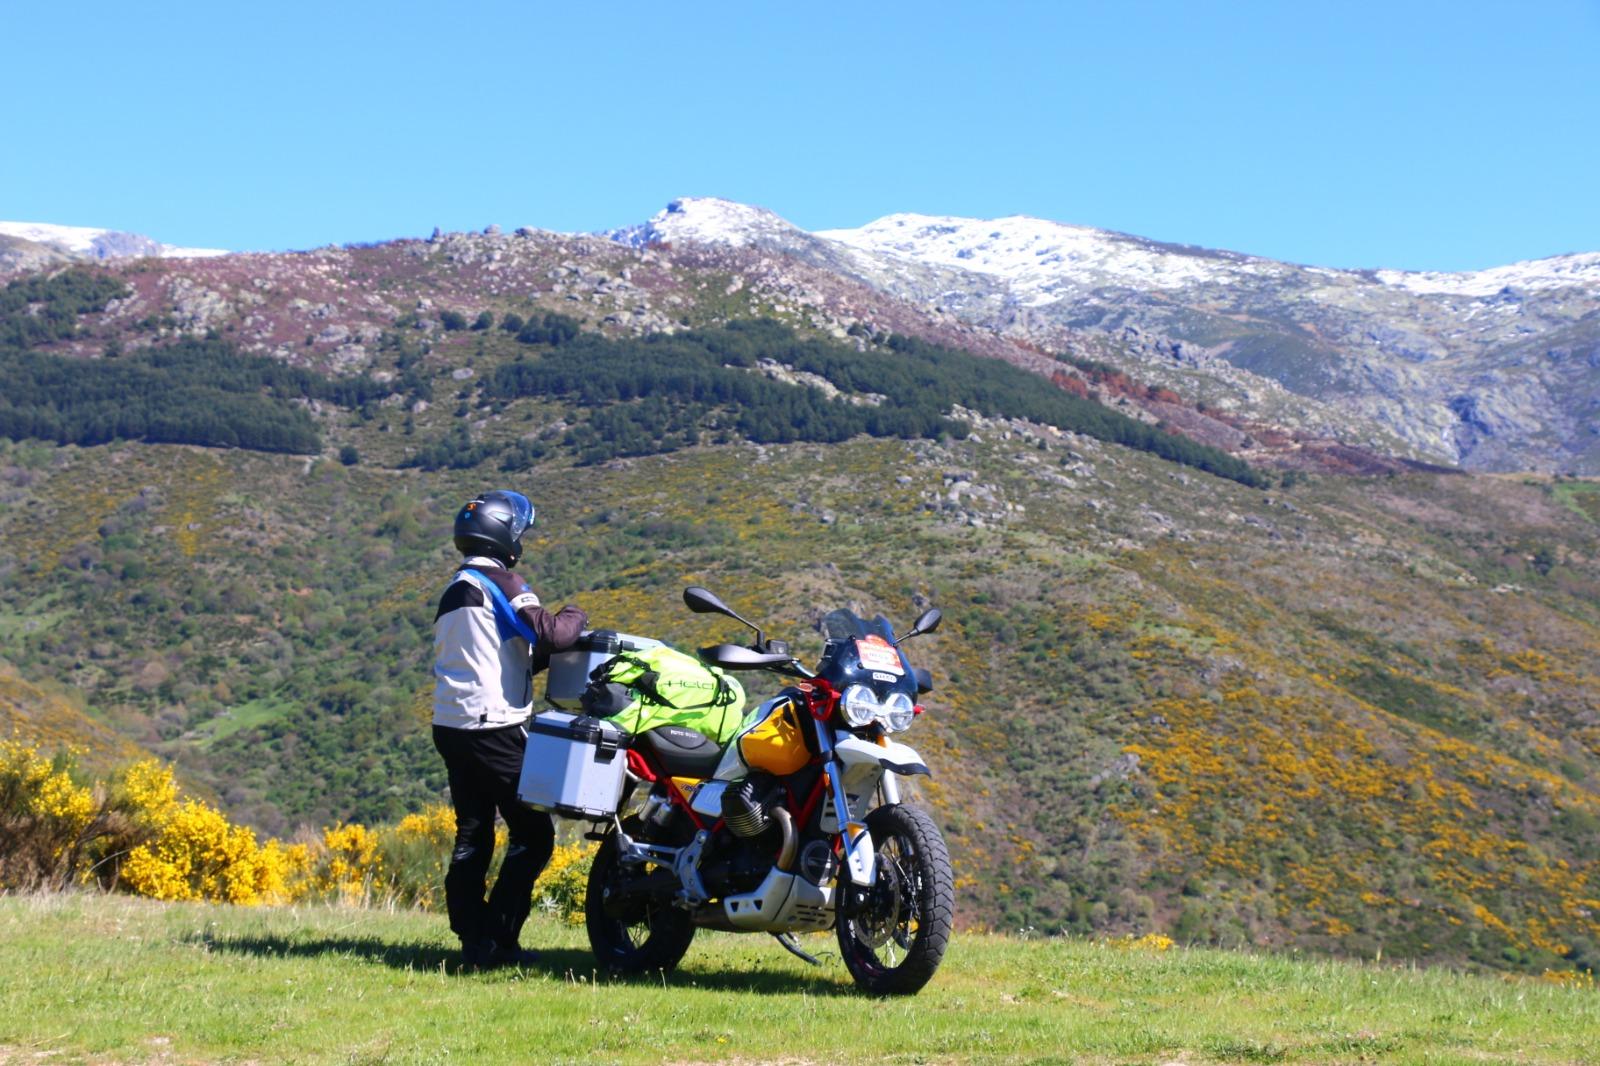 Copa de España de Mototurismo Adventure (CEMA).